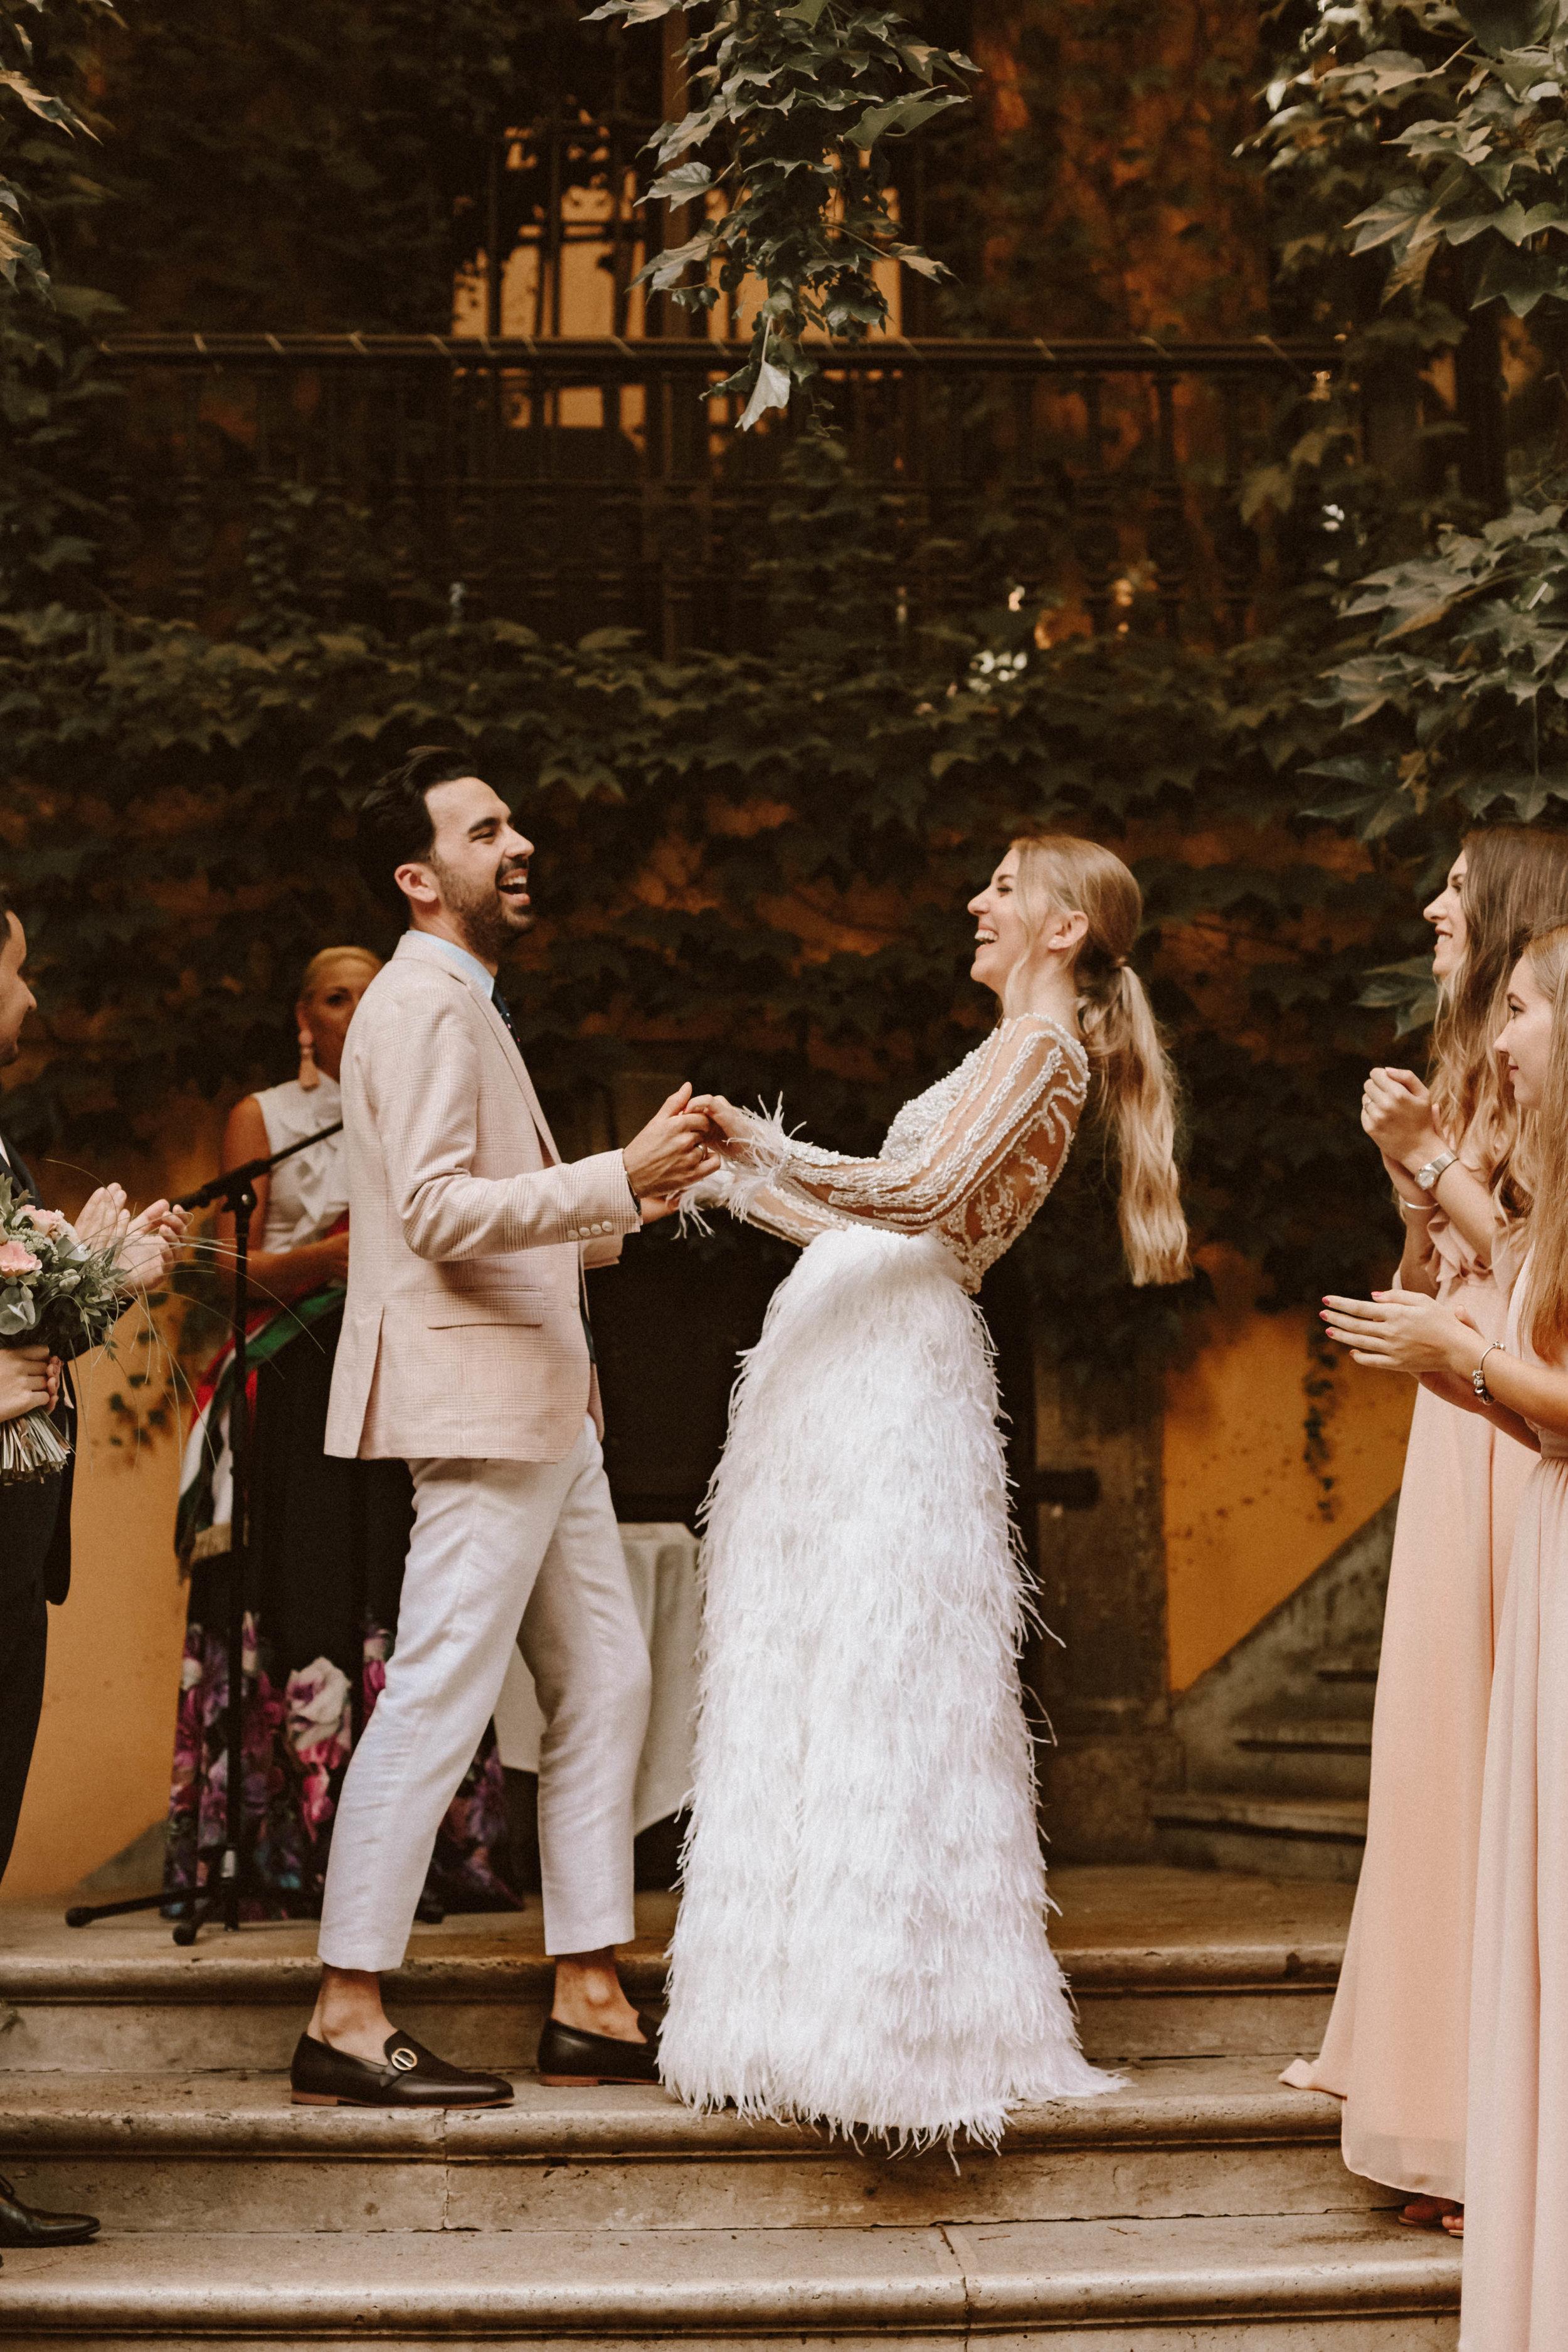 1819-Evelin+Peti-wedding-274-w.jpg